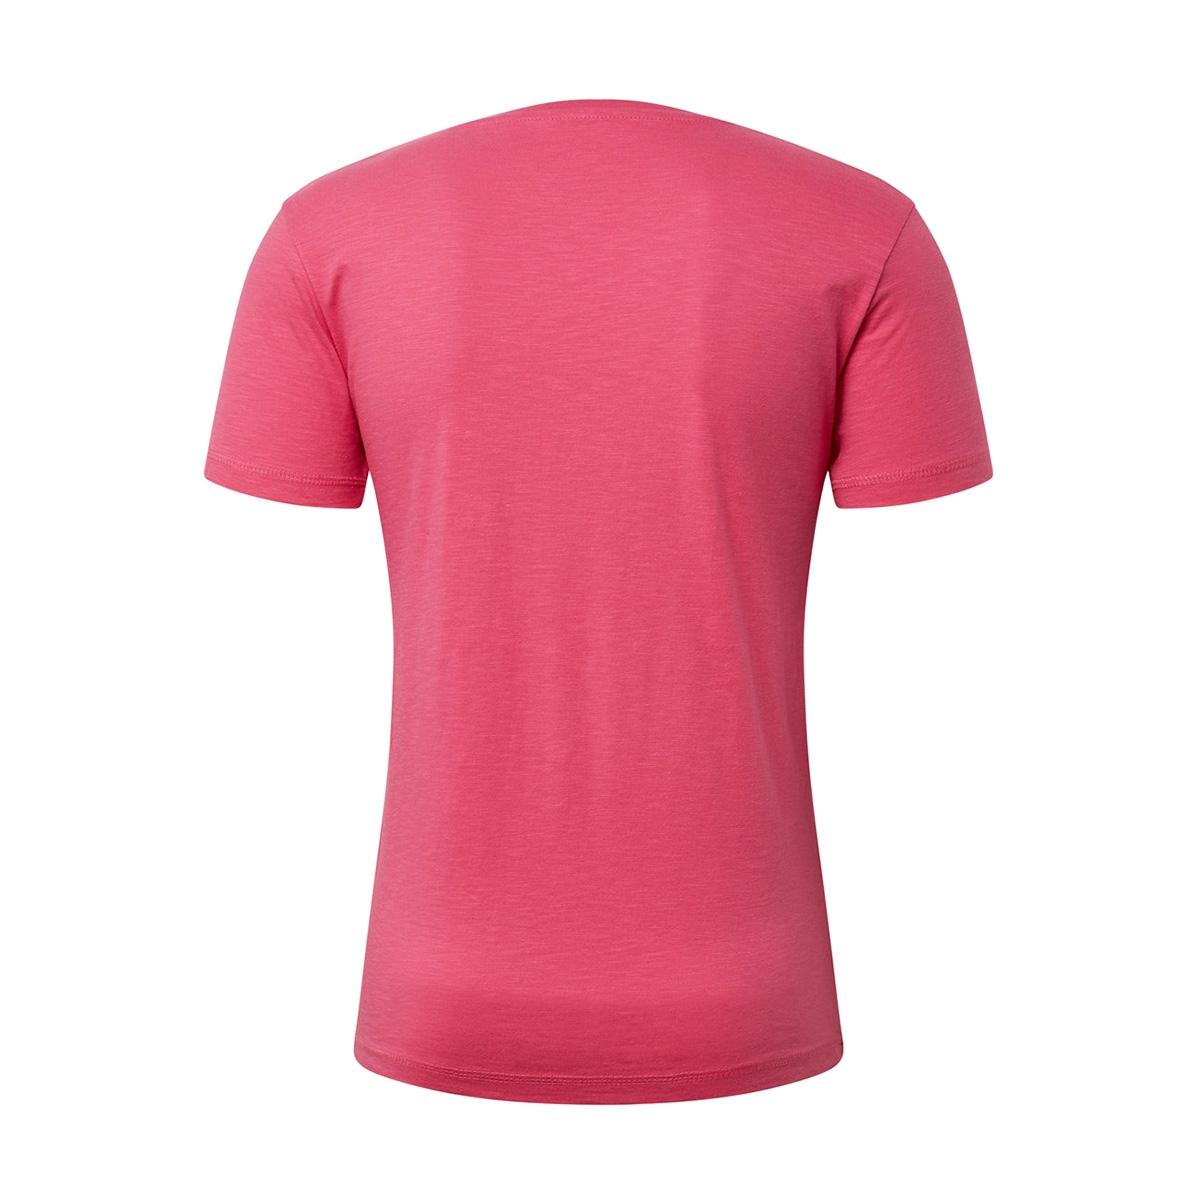 t shirt met print 1010043xx12 tom tailor t-shirt 16204